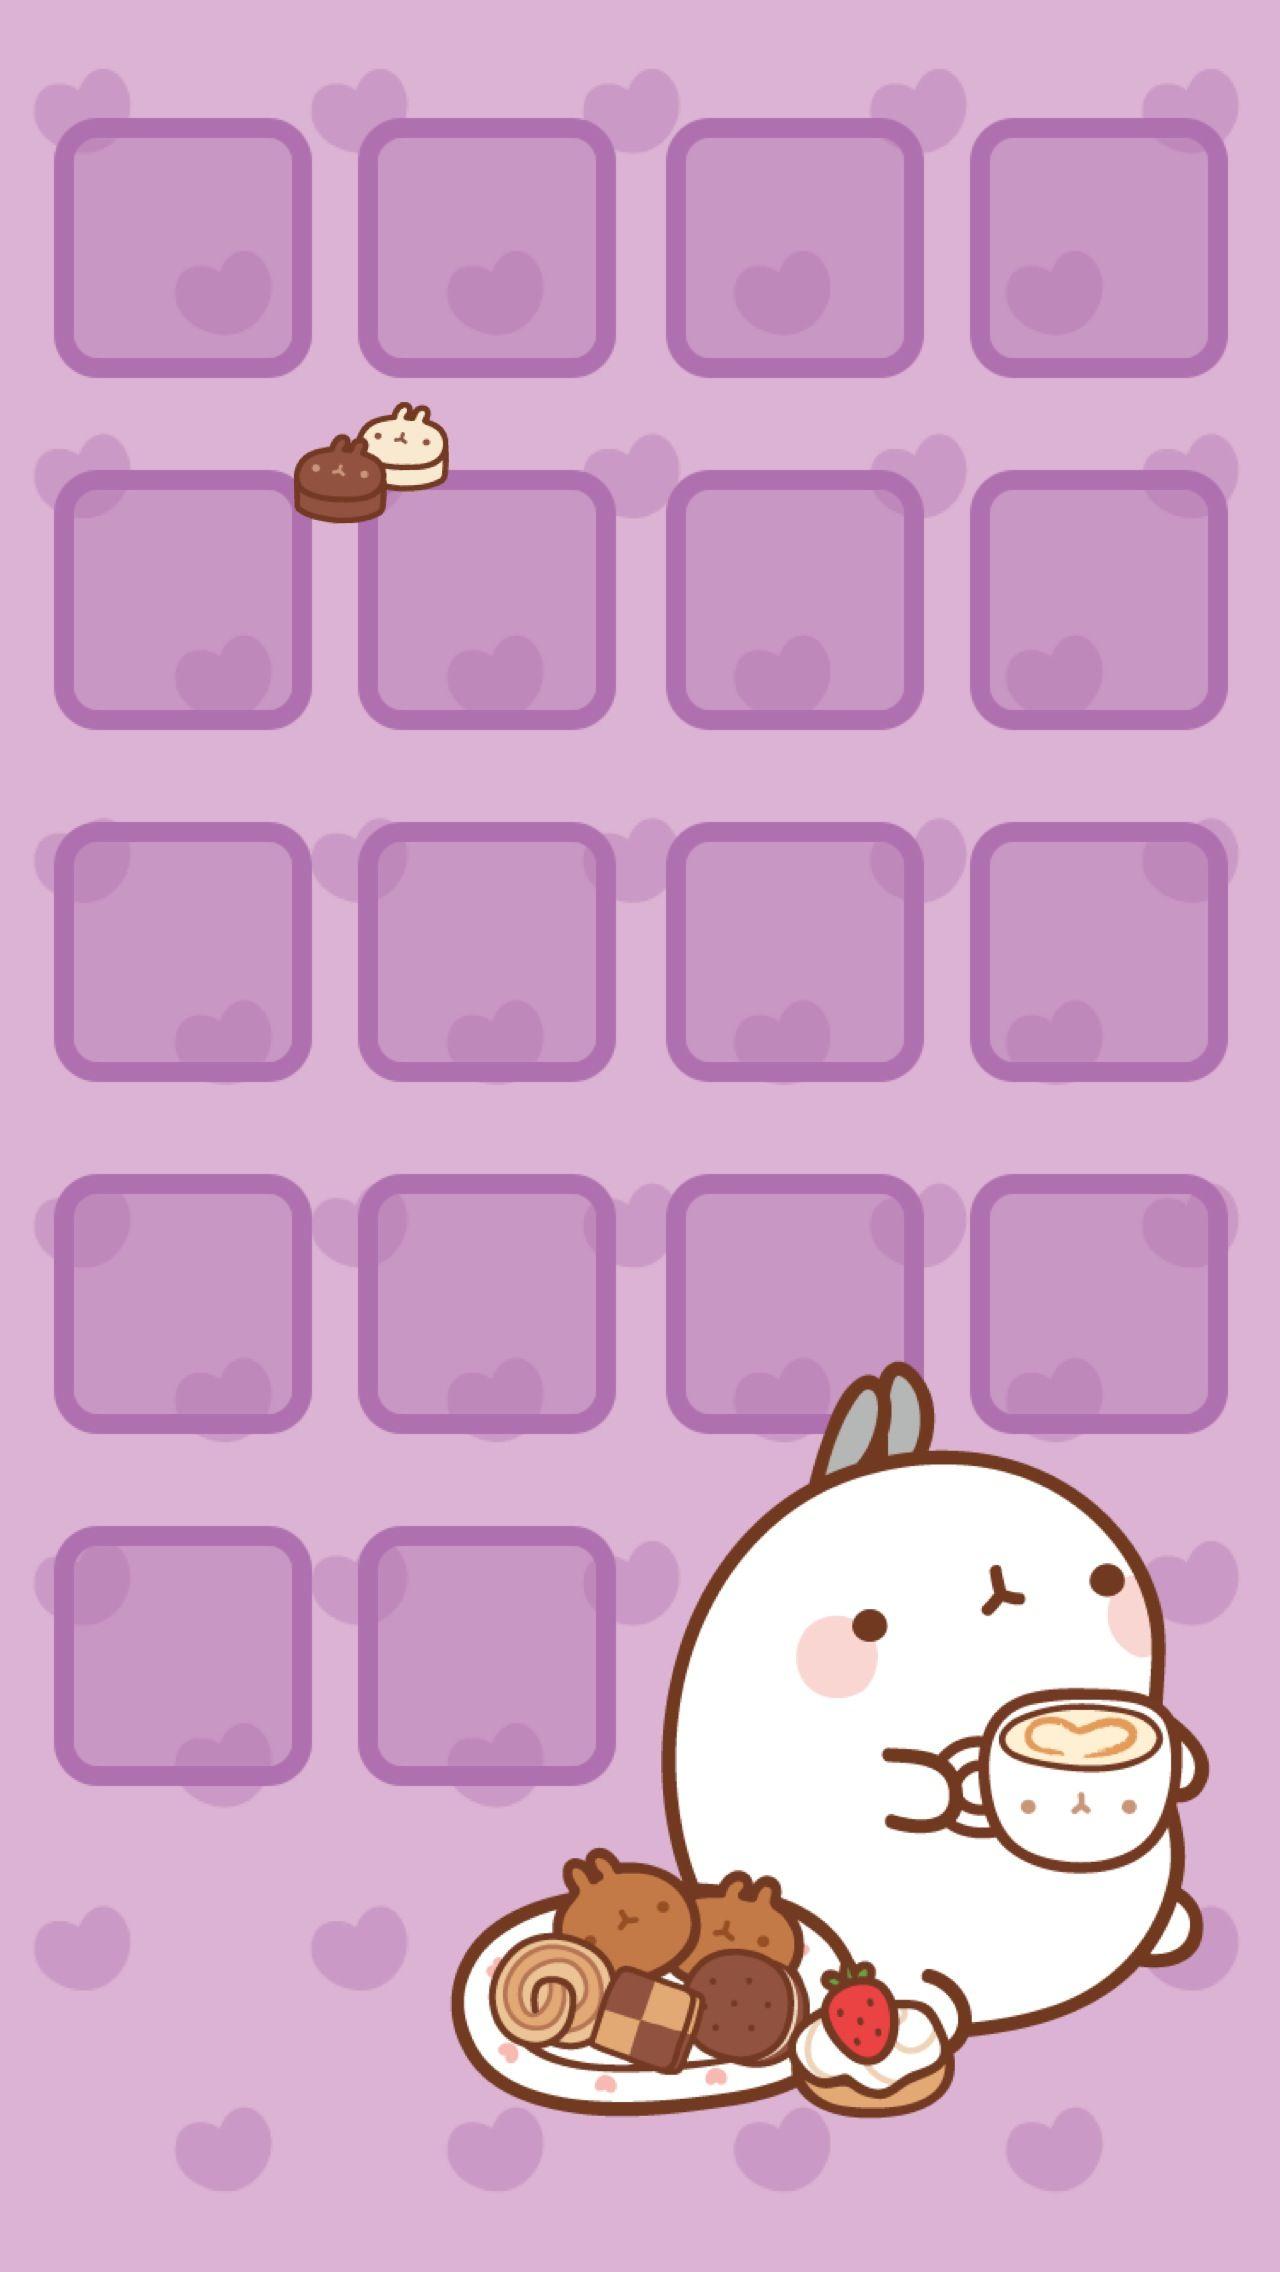 Iphone 5 wallpaper tumblr girly pink - Iphone Wallpaper Tumblr Kawaii Pesquisa Google